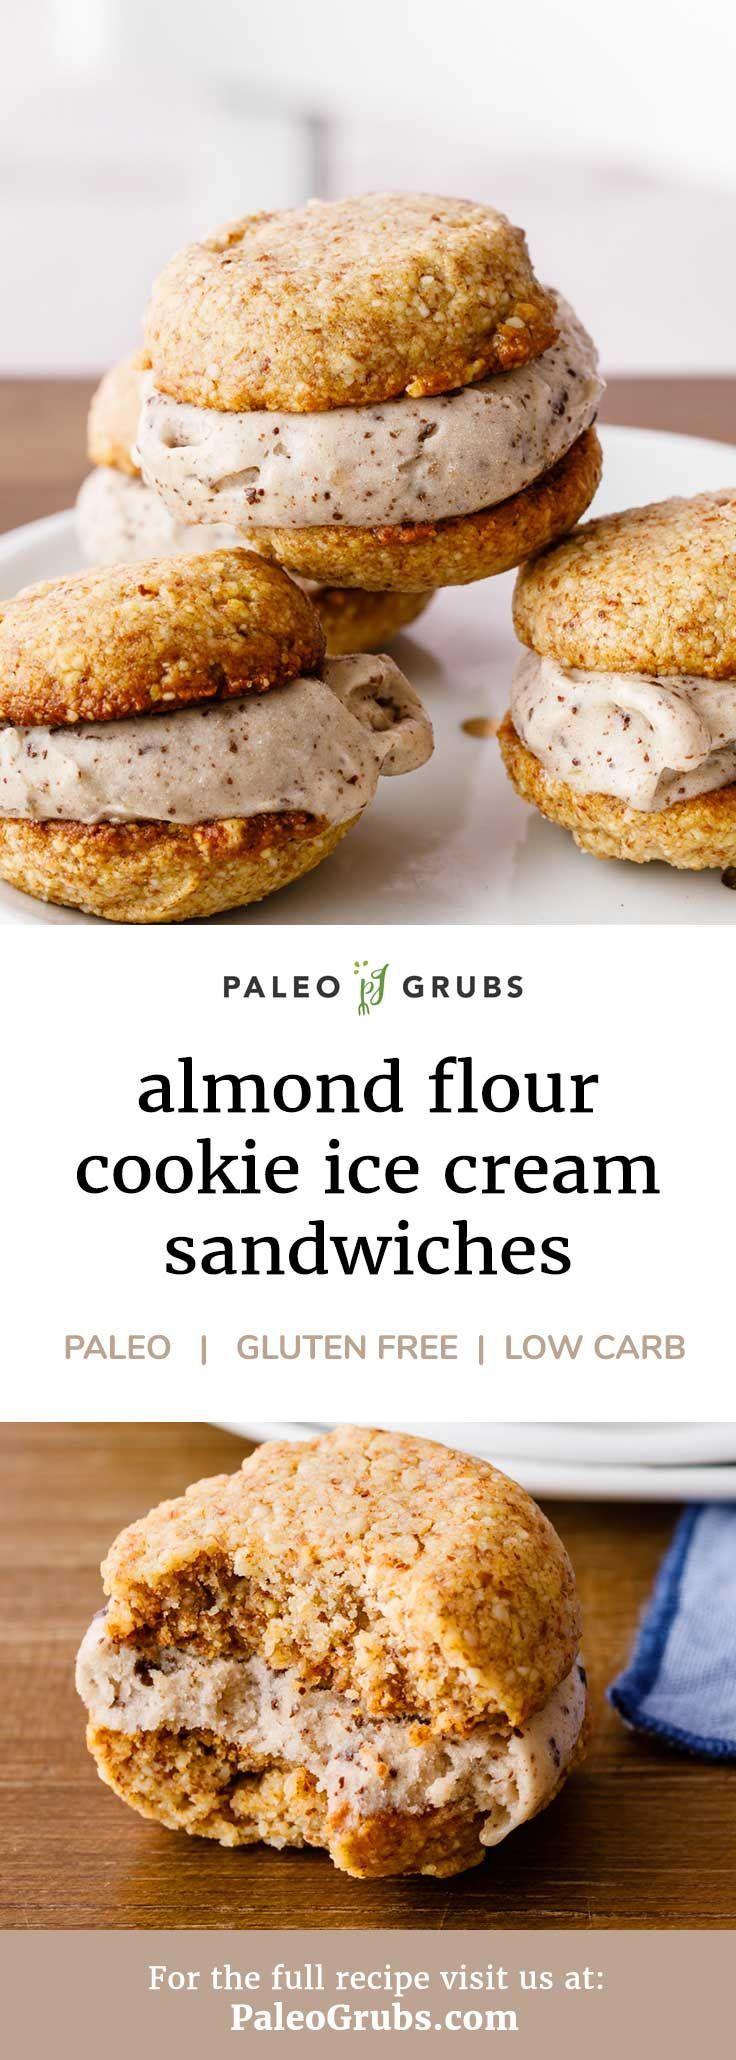 dairy free cookies and cream ice cream